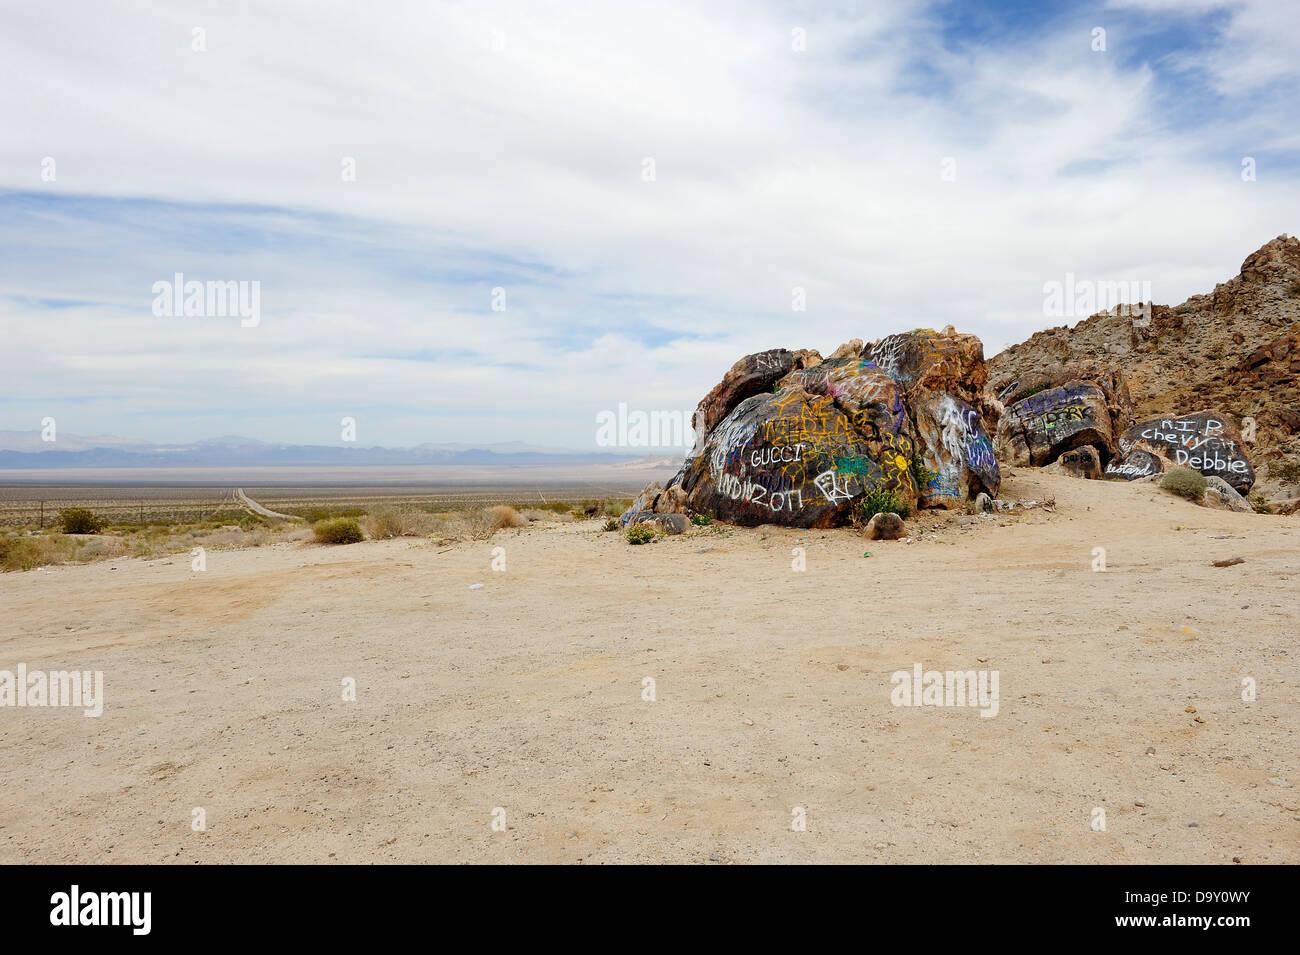 Mojave Desert landscape littered with rubbish and graffiti, California USA. - Stock Image